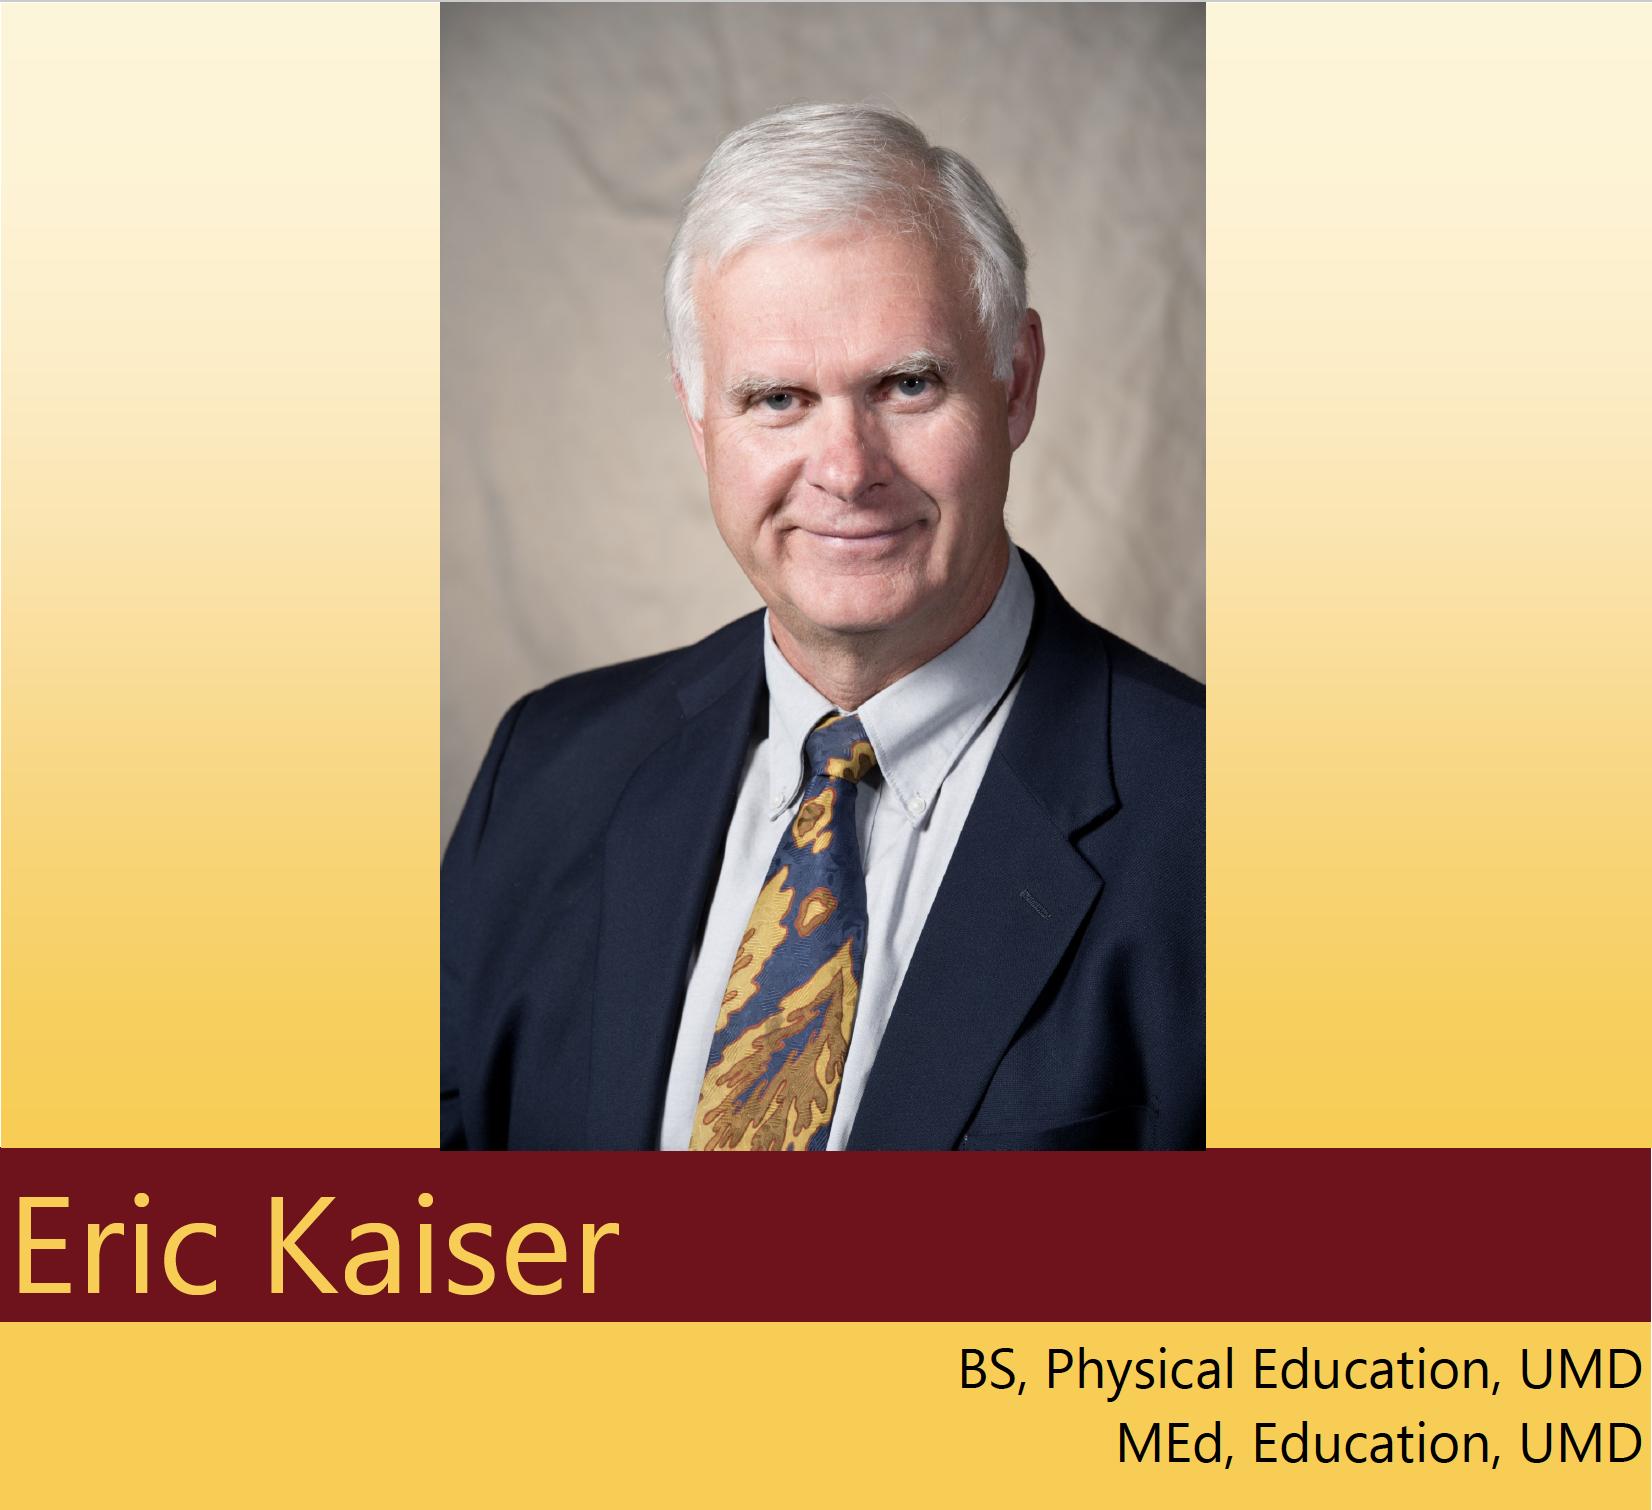 Eric Kaiser